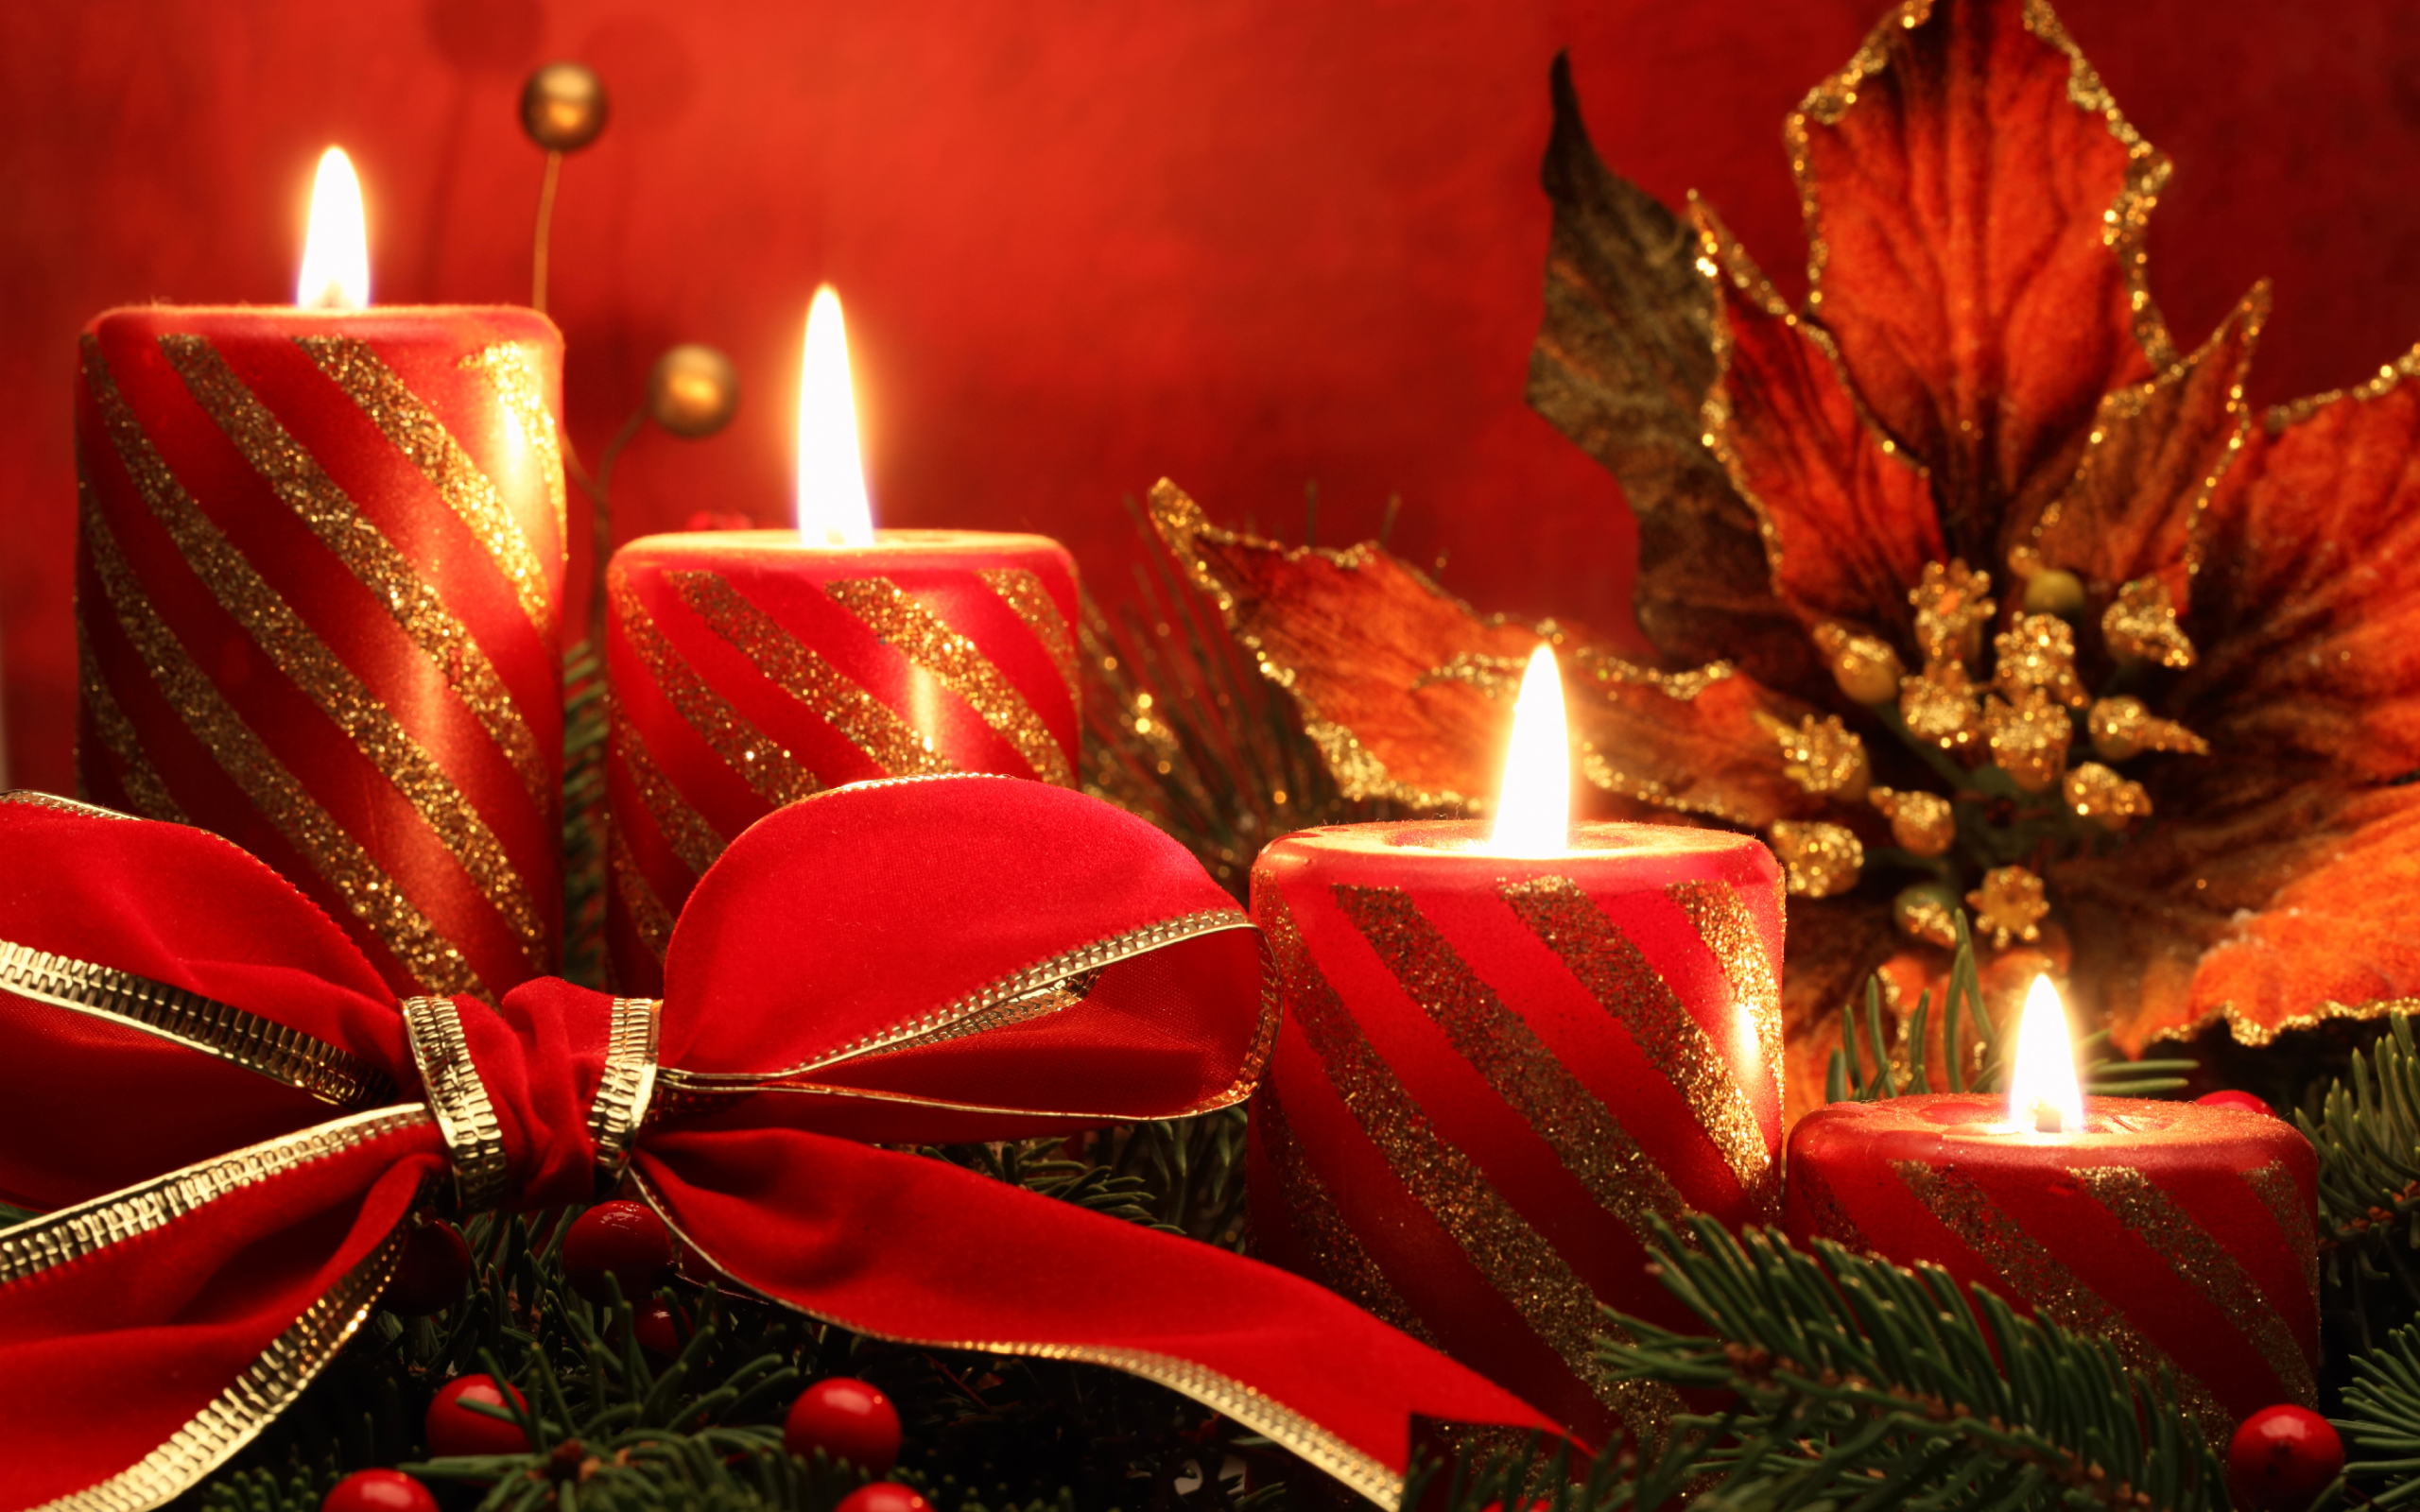 Download Holiday Christmas Wallpaper 2560x1600 | Wallpoper ...